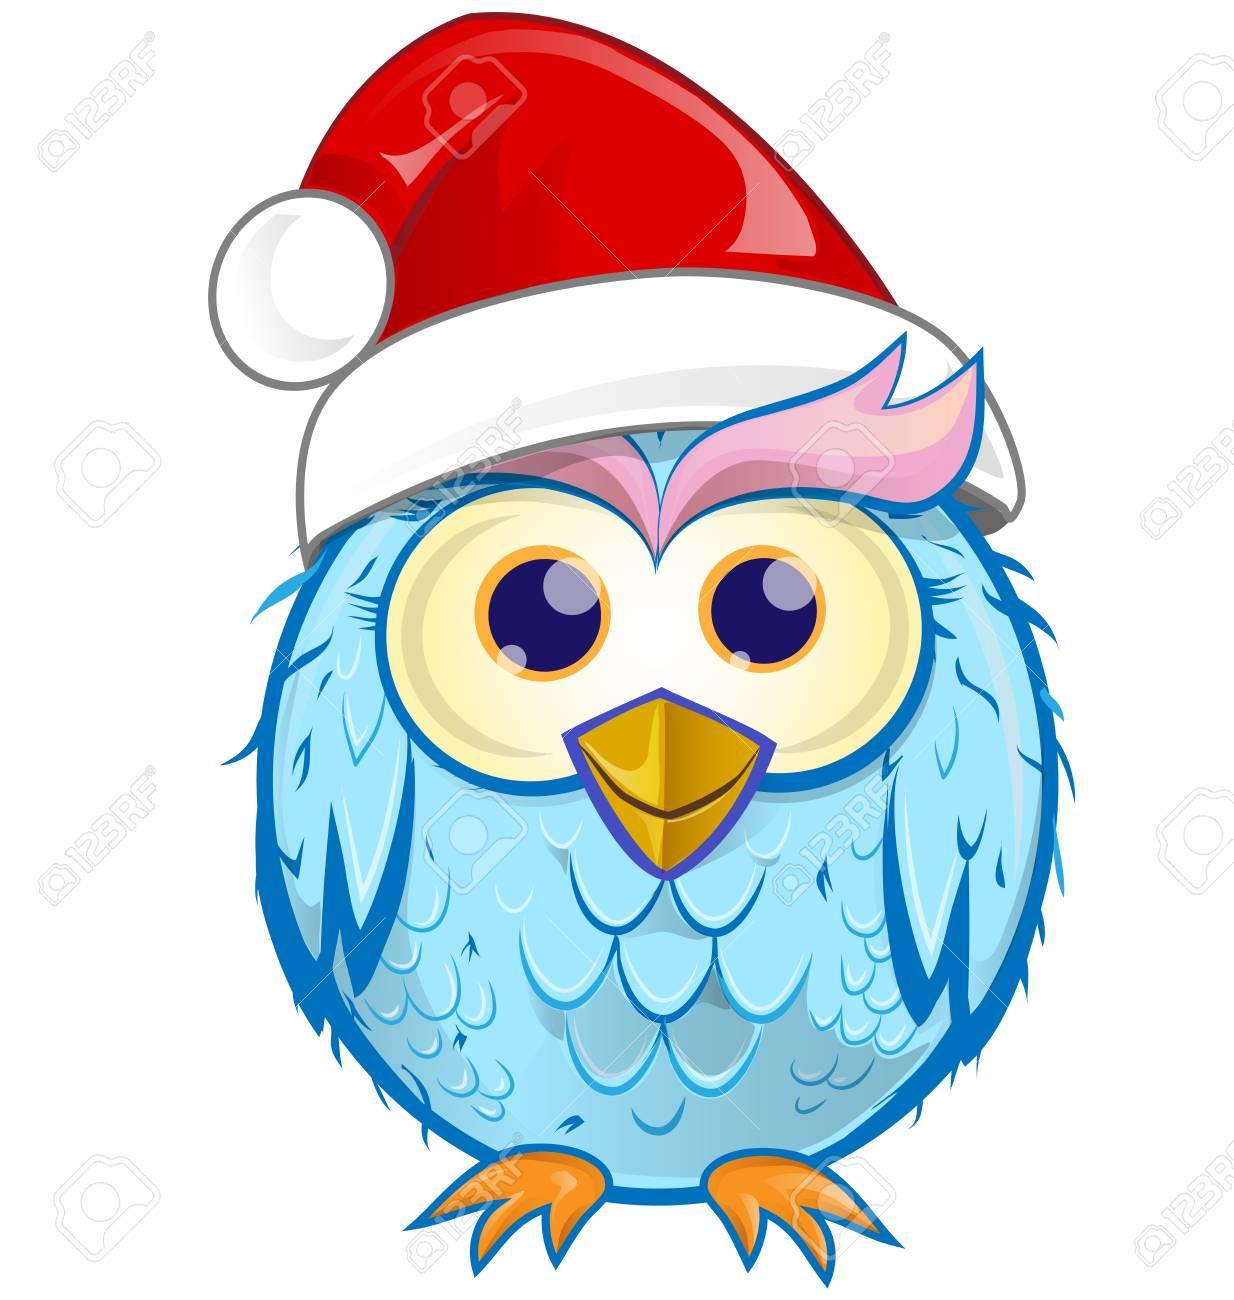 Christmas Owl.Christmas Owl Cartoon Isolated On White Background